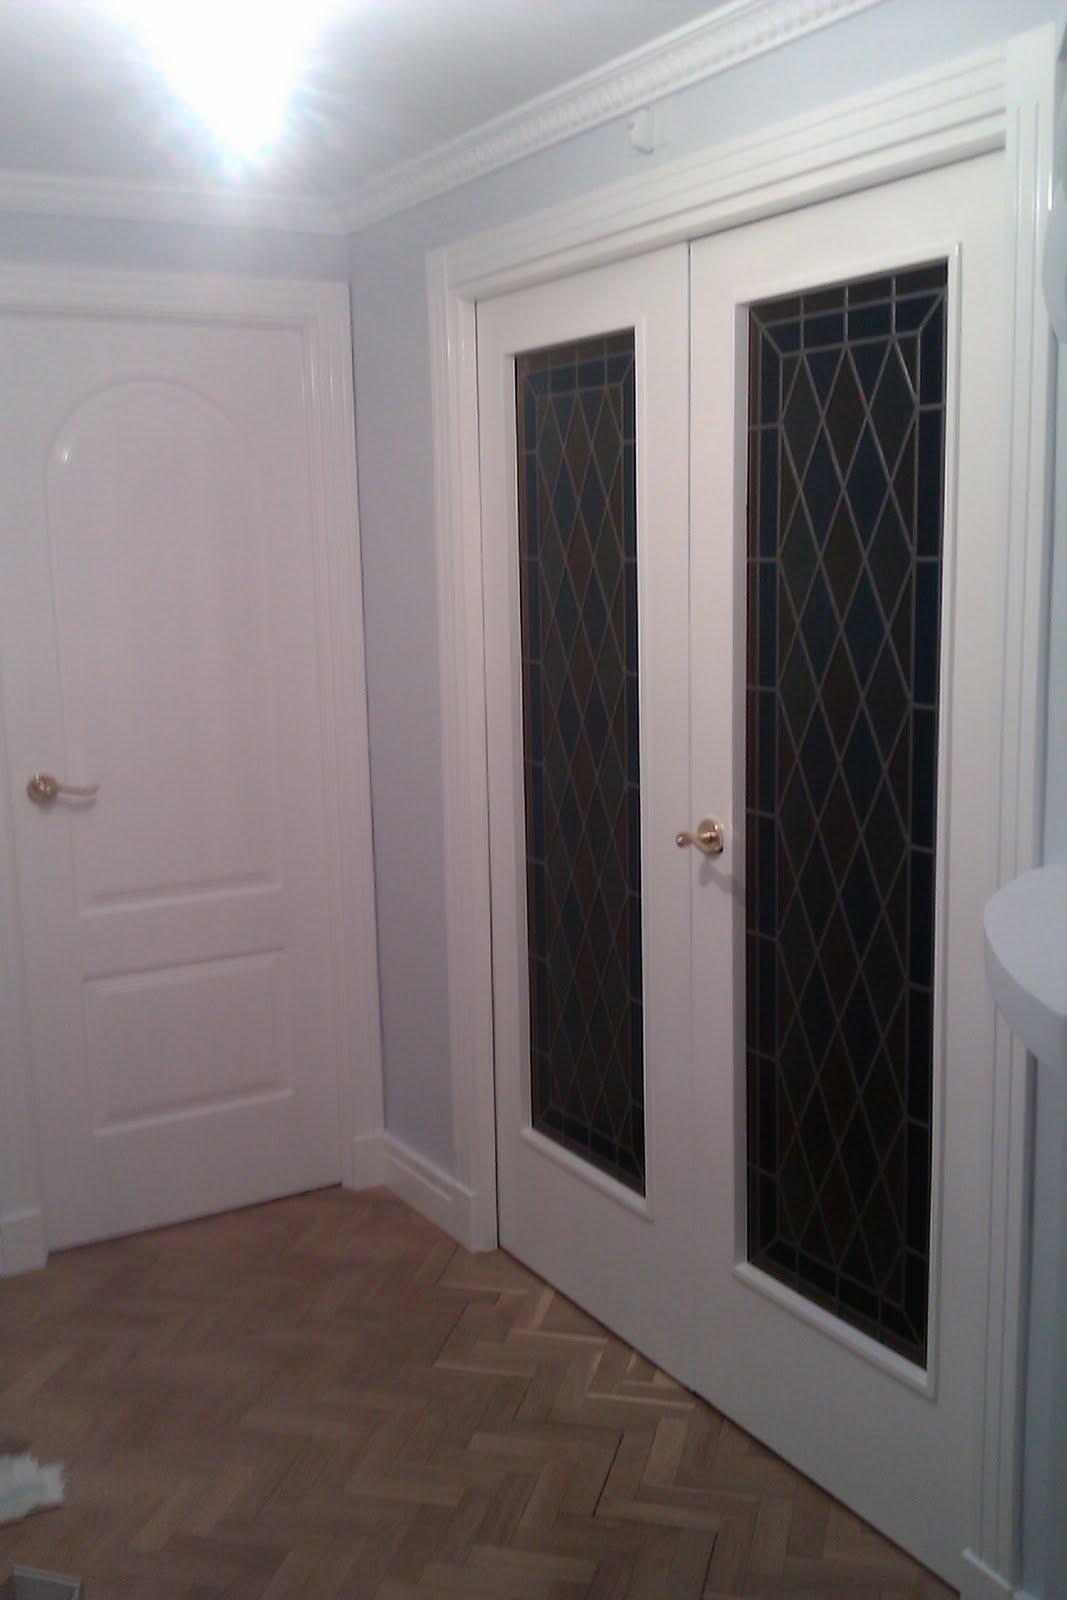 Carpinteria ebasan www cubomural com piso de puertas lacadas for Puertas para pisos